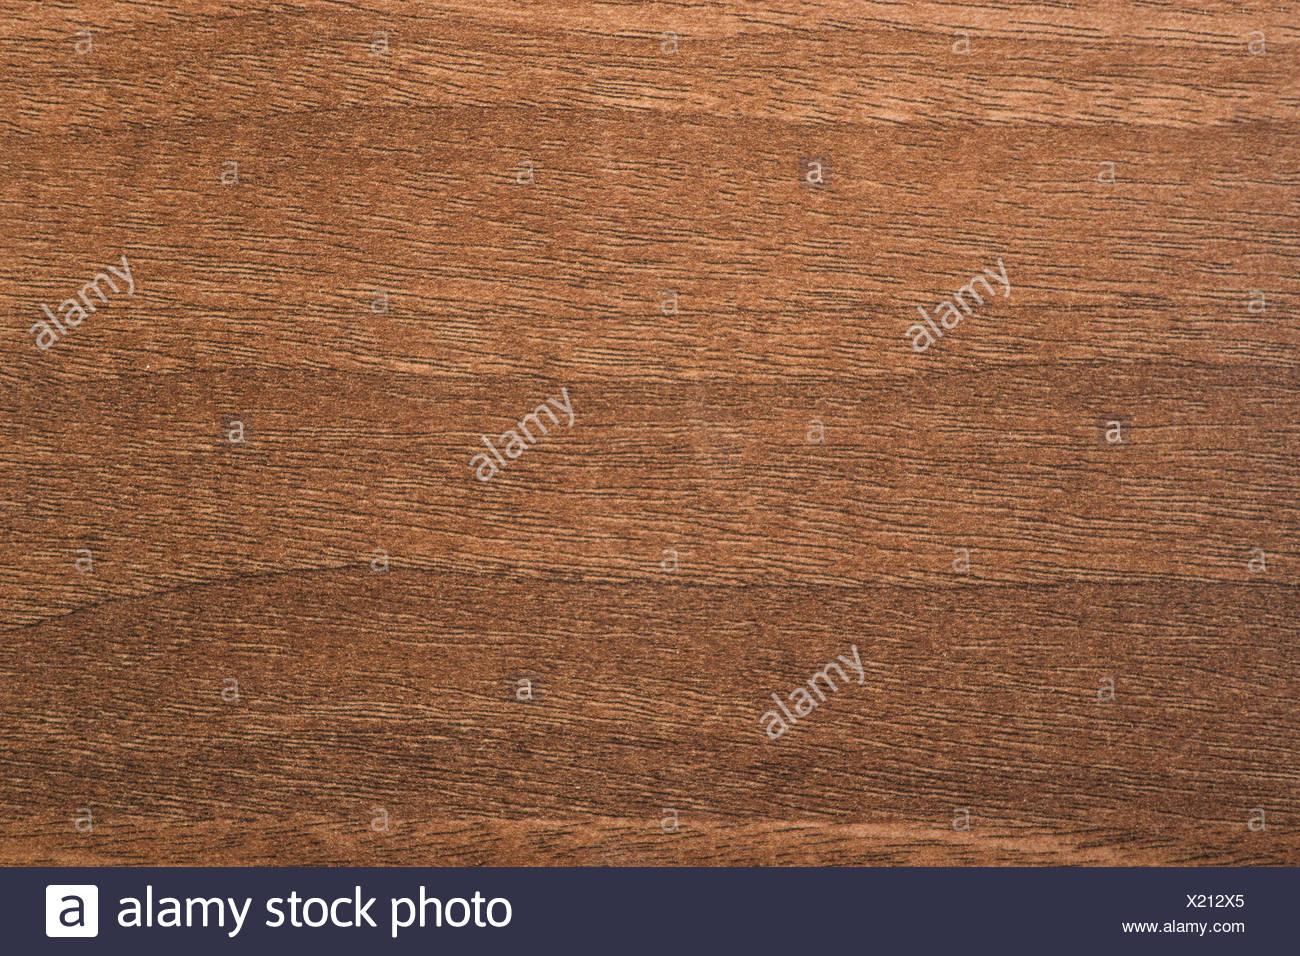 Aida walnut tree Wooden texture Stock Photo: 276619453 - Alamy